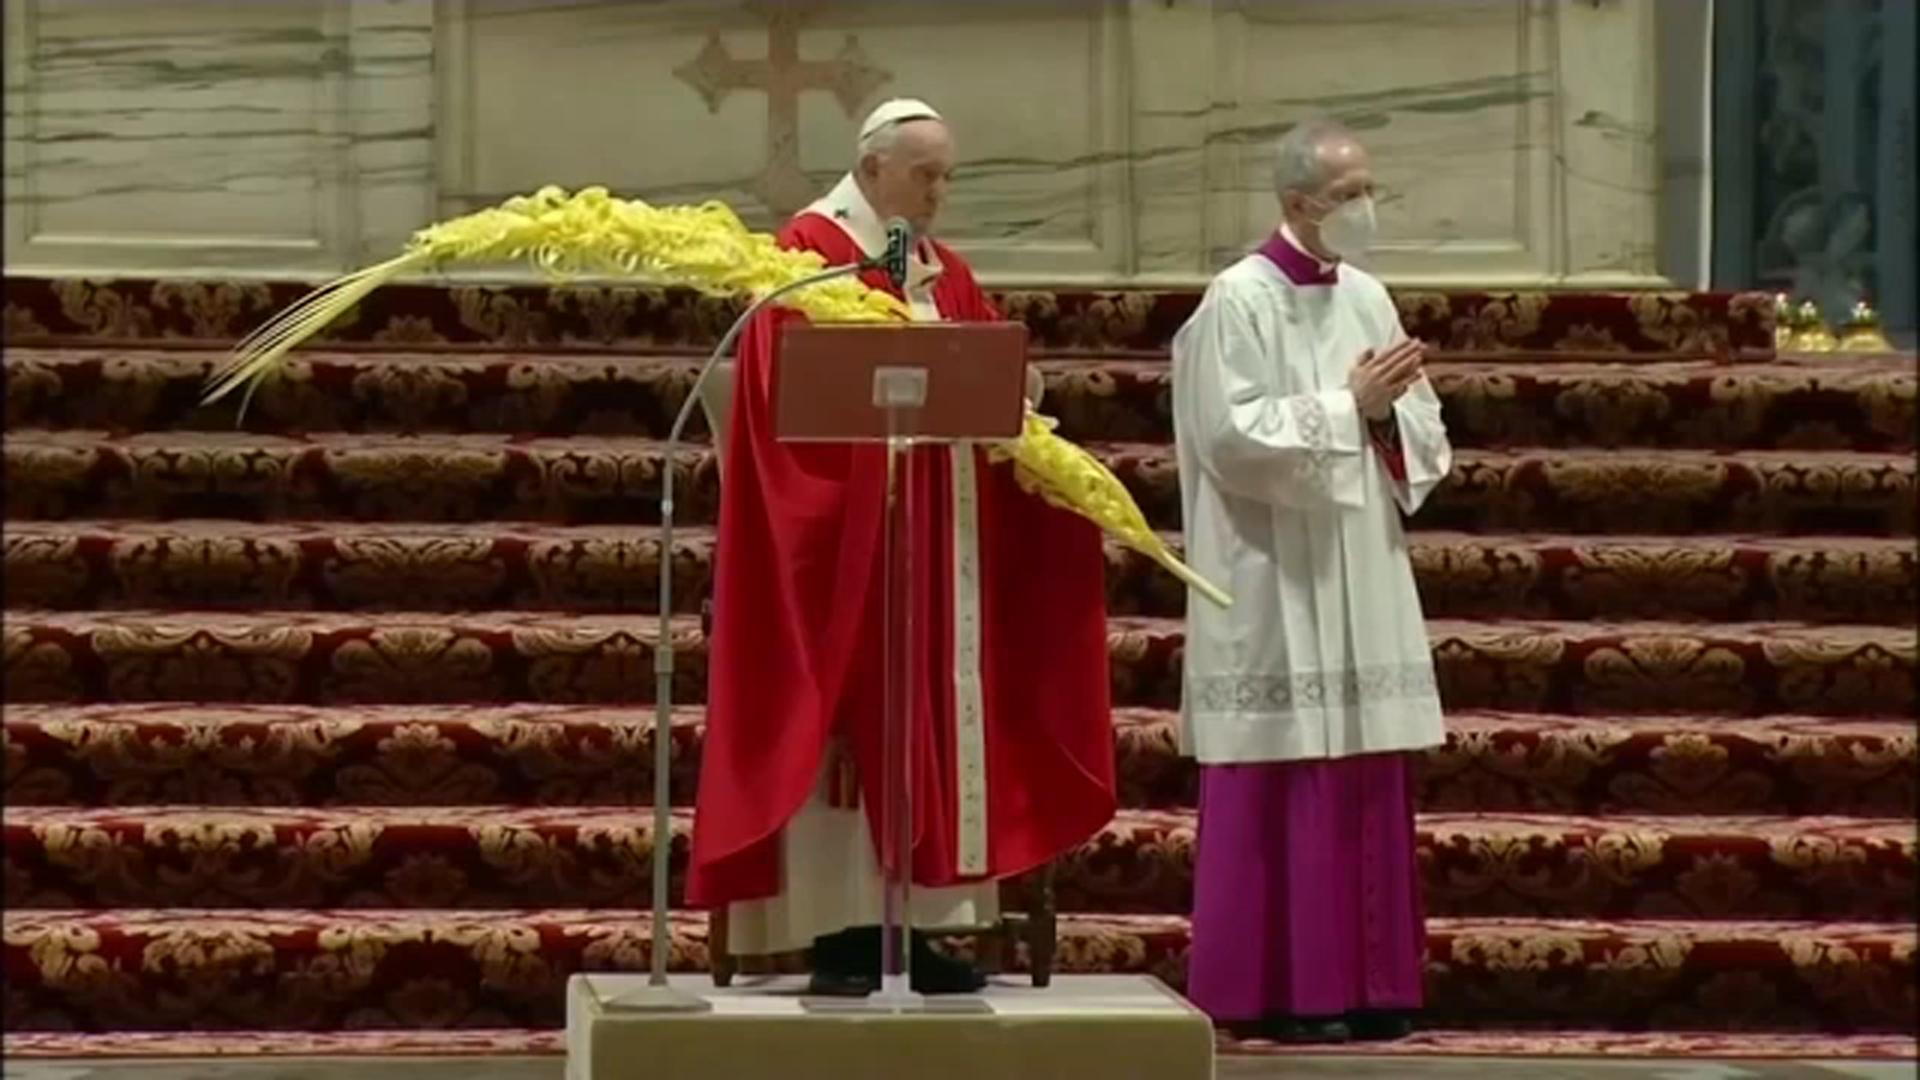 Palm Sunday: What do Christians celebrate? - ABC7 Chicago